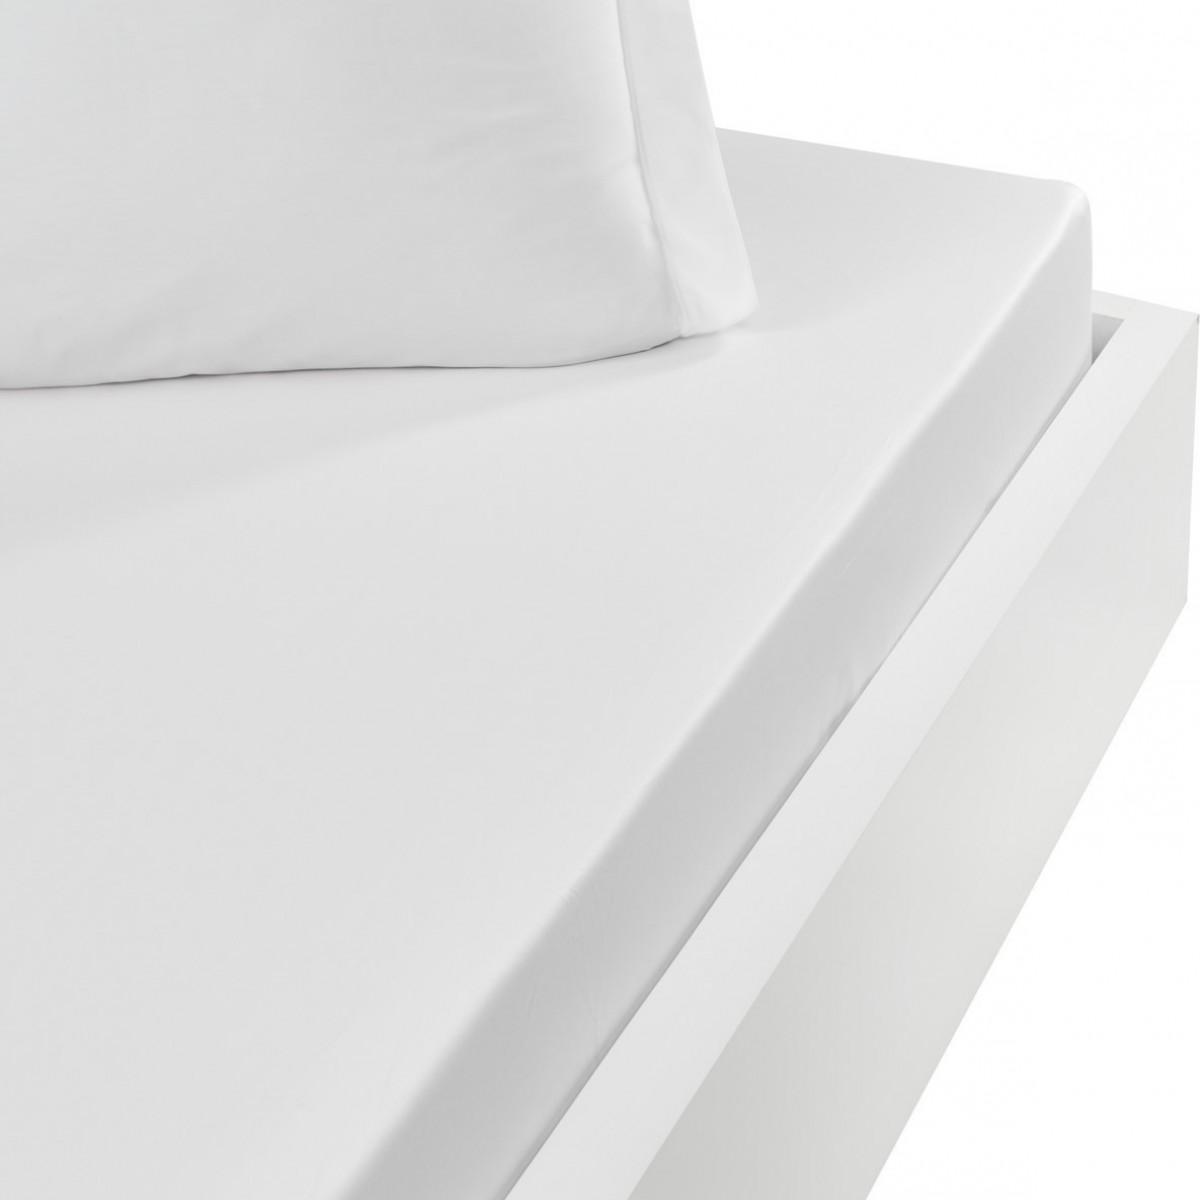 Drap housse en percale de coton bon Blanc 140x190 cm